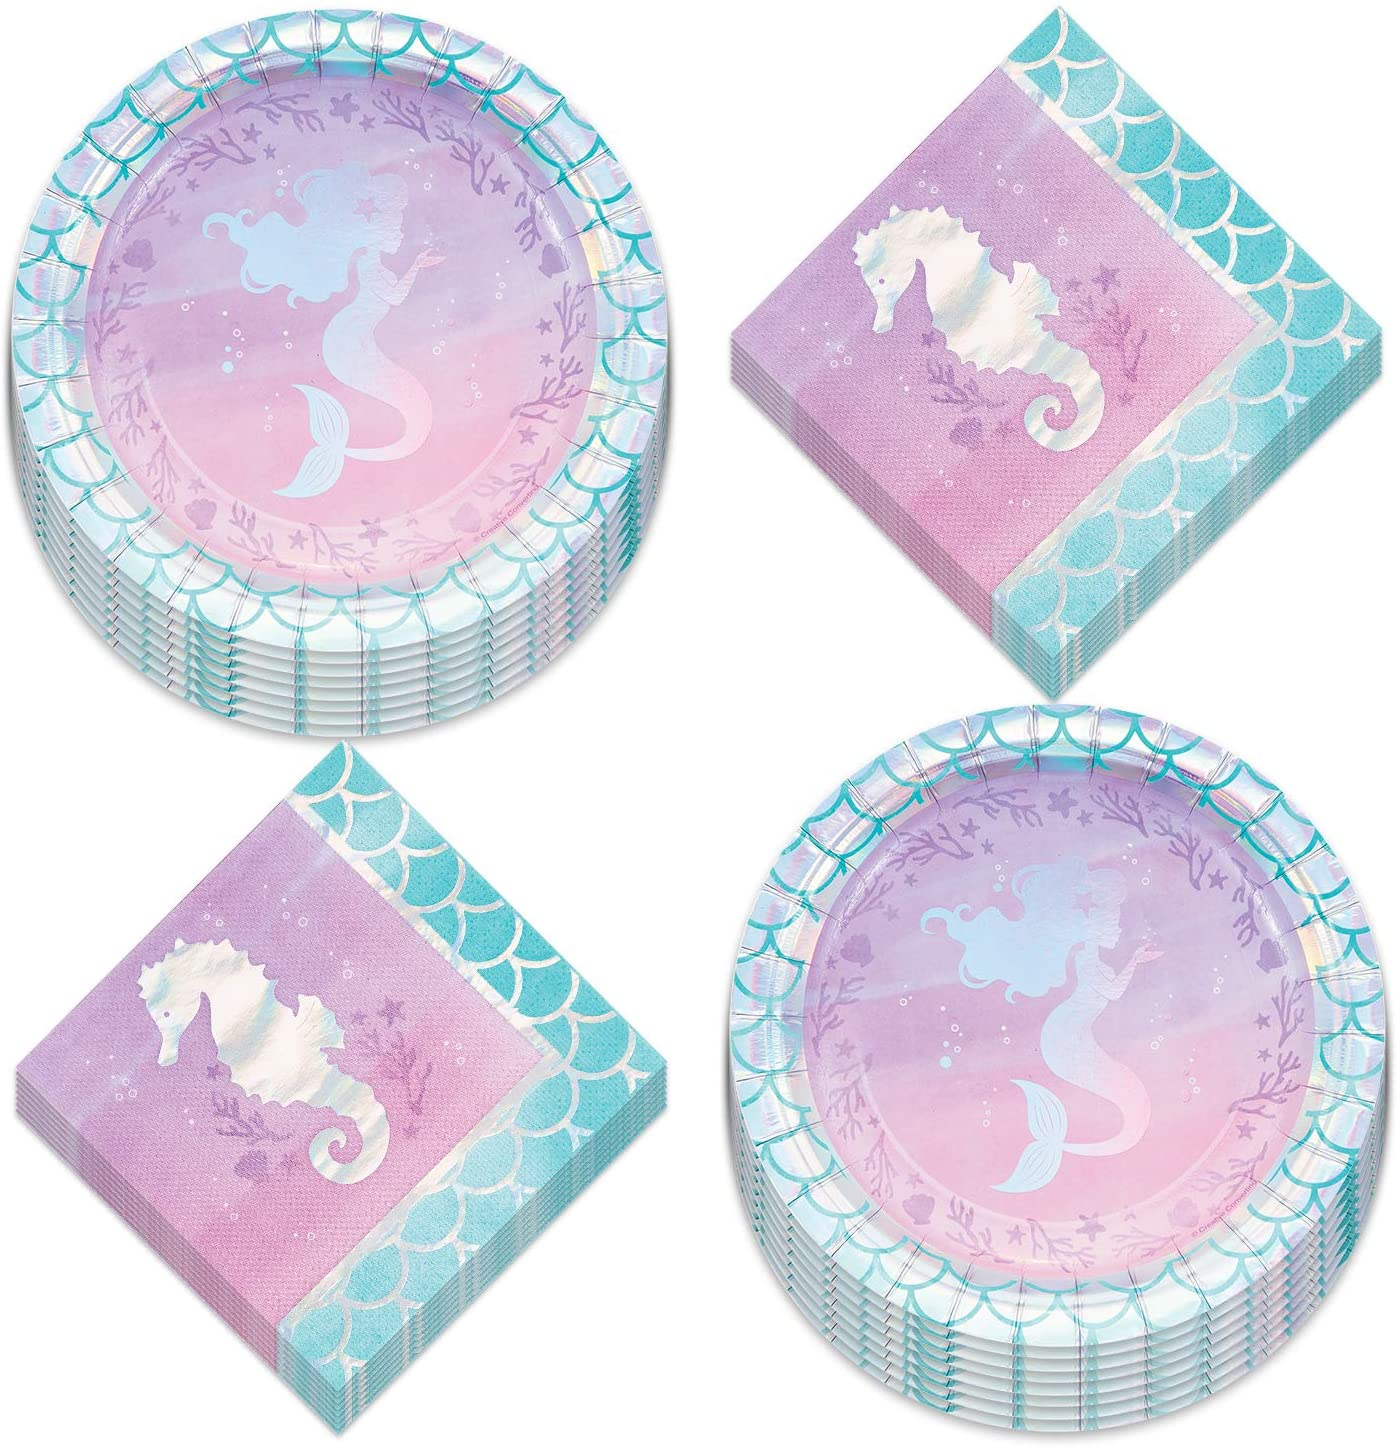 Mermaid Shine Party Supplies - Metallic Mermaid Paper Dessert Plates and Beverage Napkins (Serves 16)